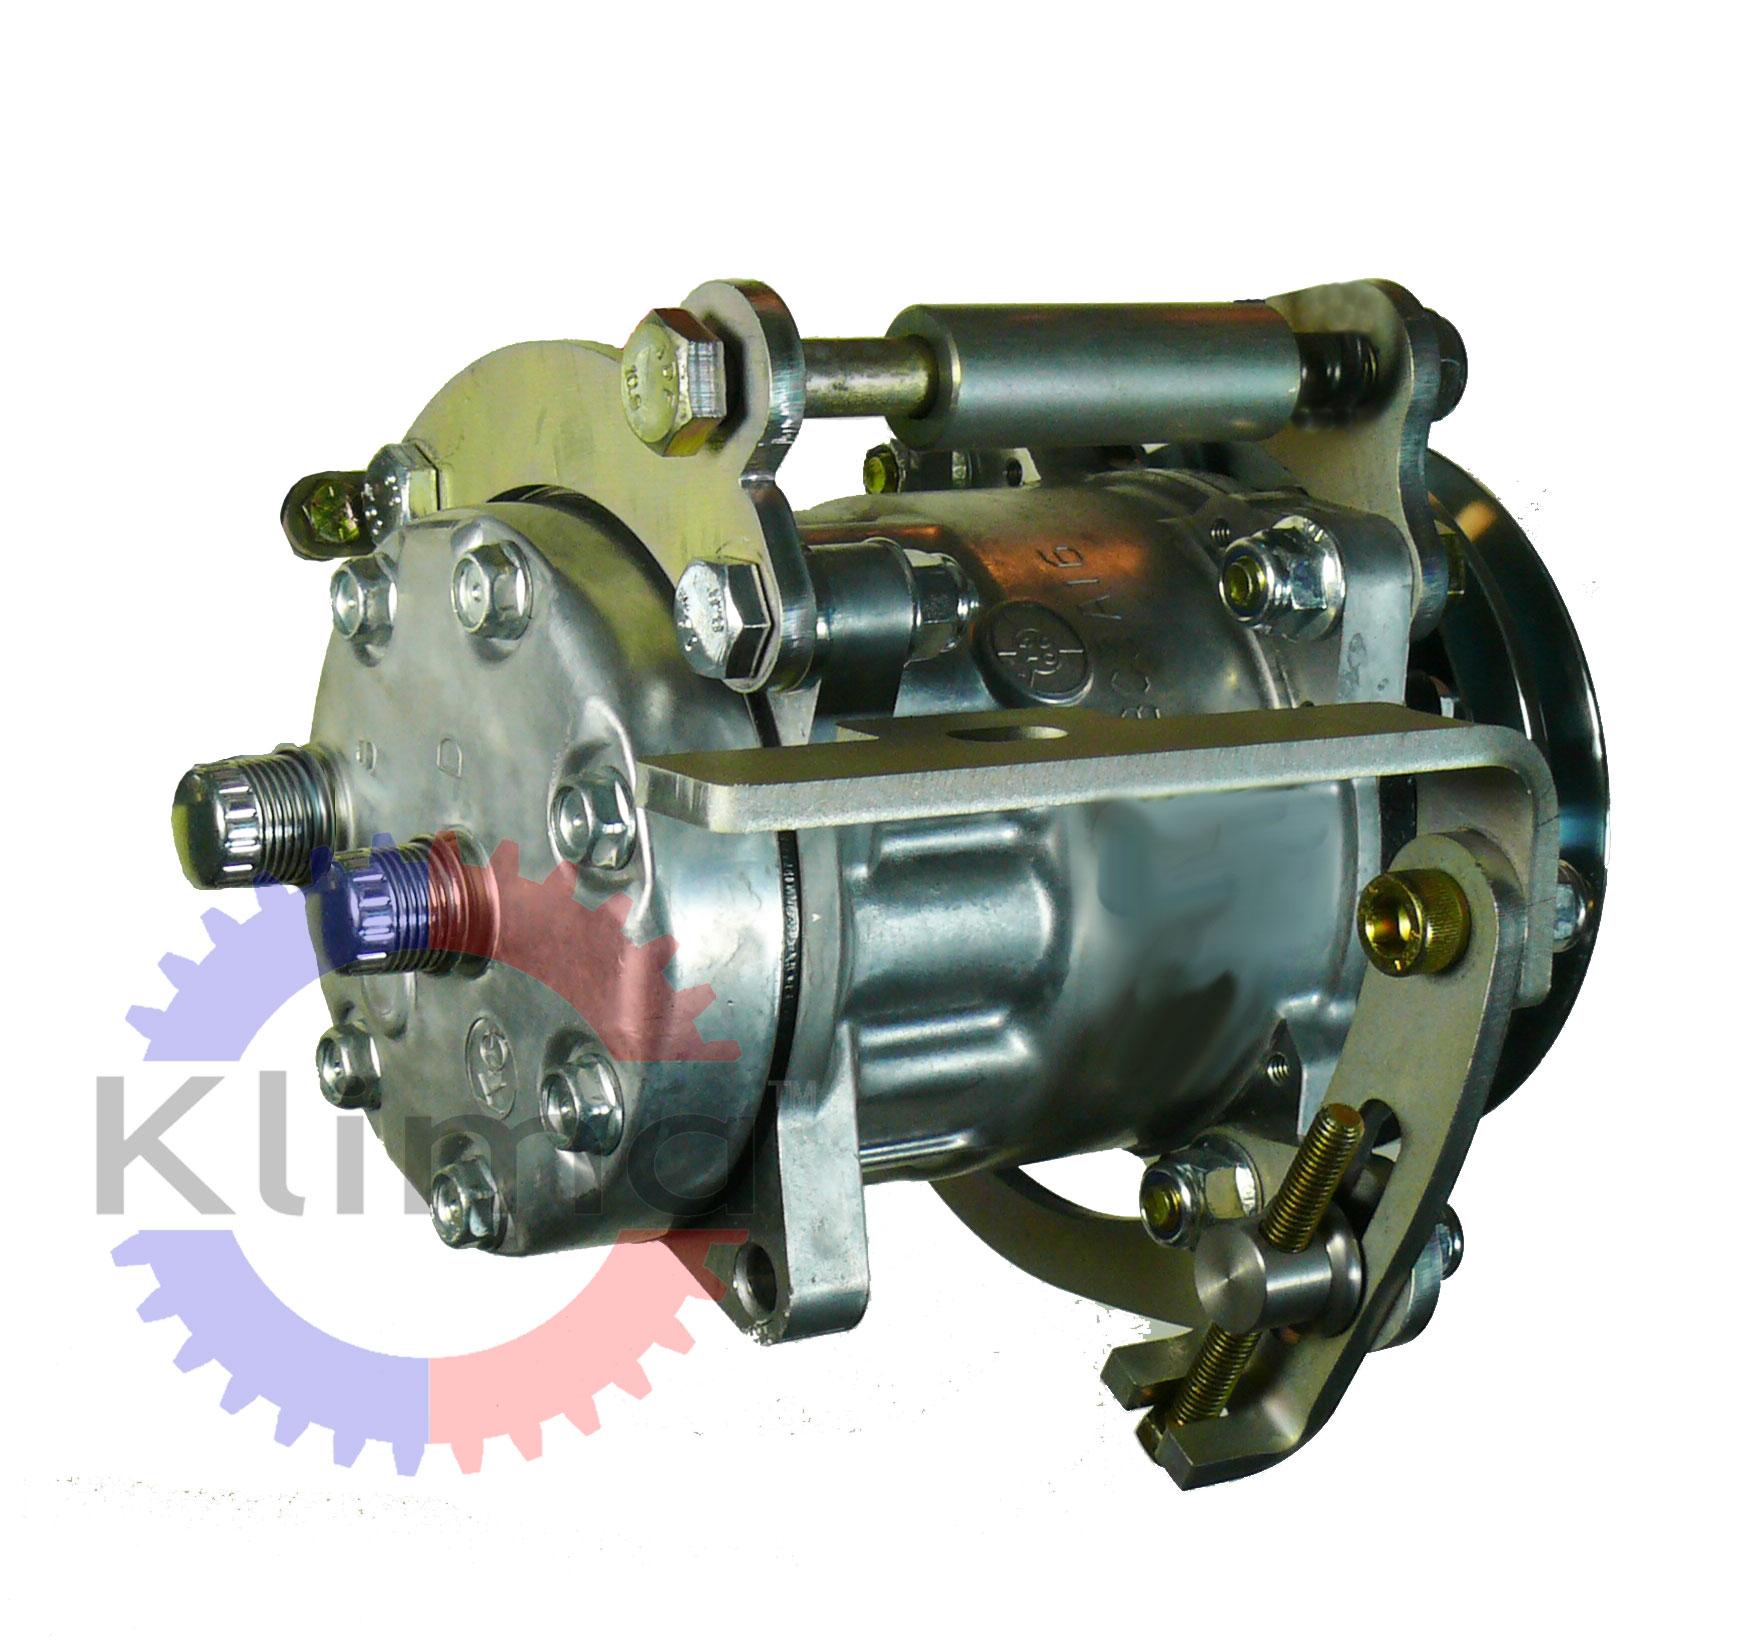 W126 Sanden SD A/C Compressor Mounting Kit